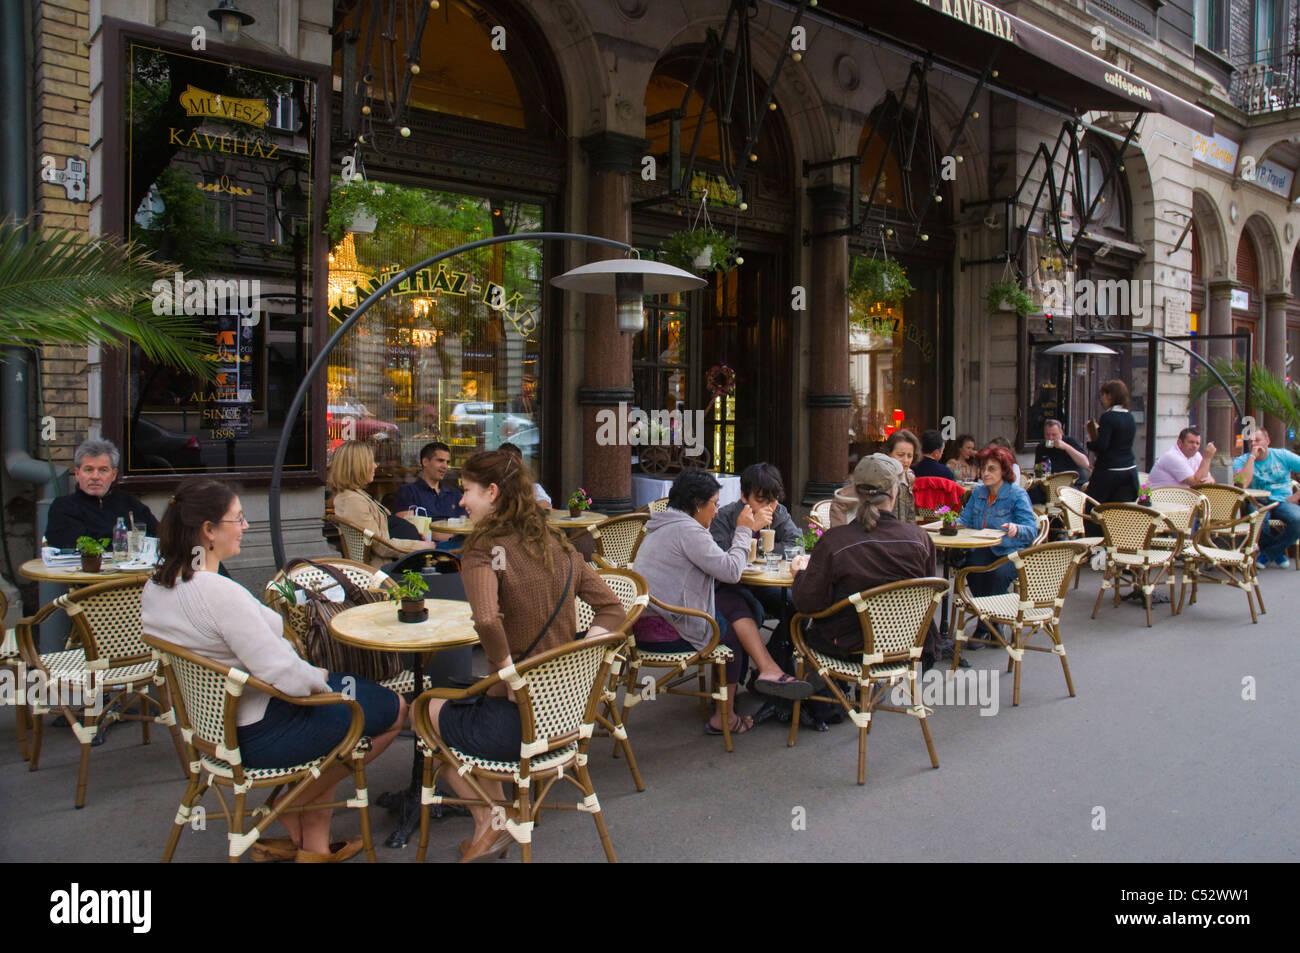 Cafe along Andrassy Utca boulevard central Budapest Hungary Europe - Stock Image